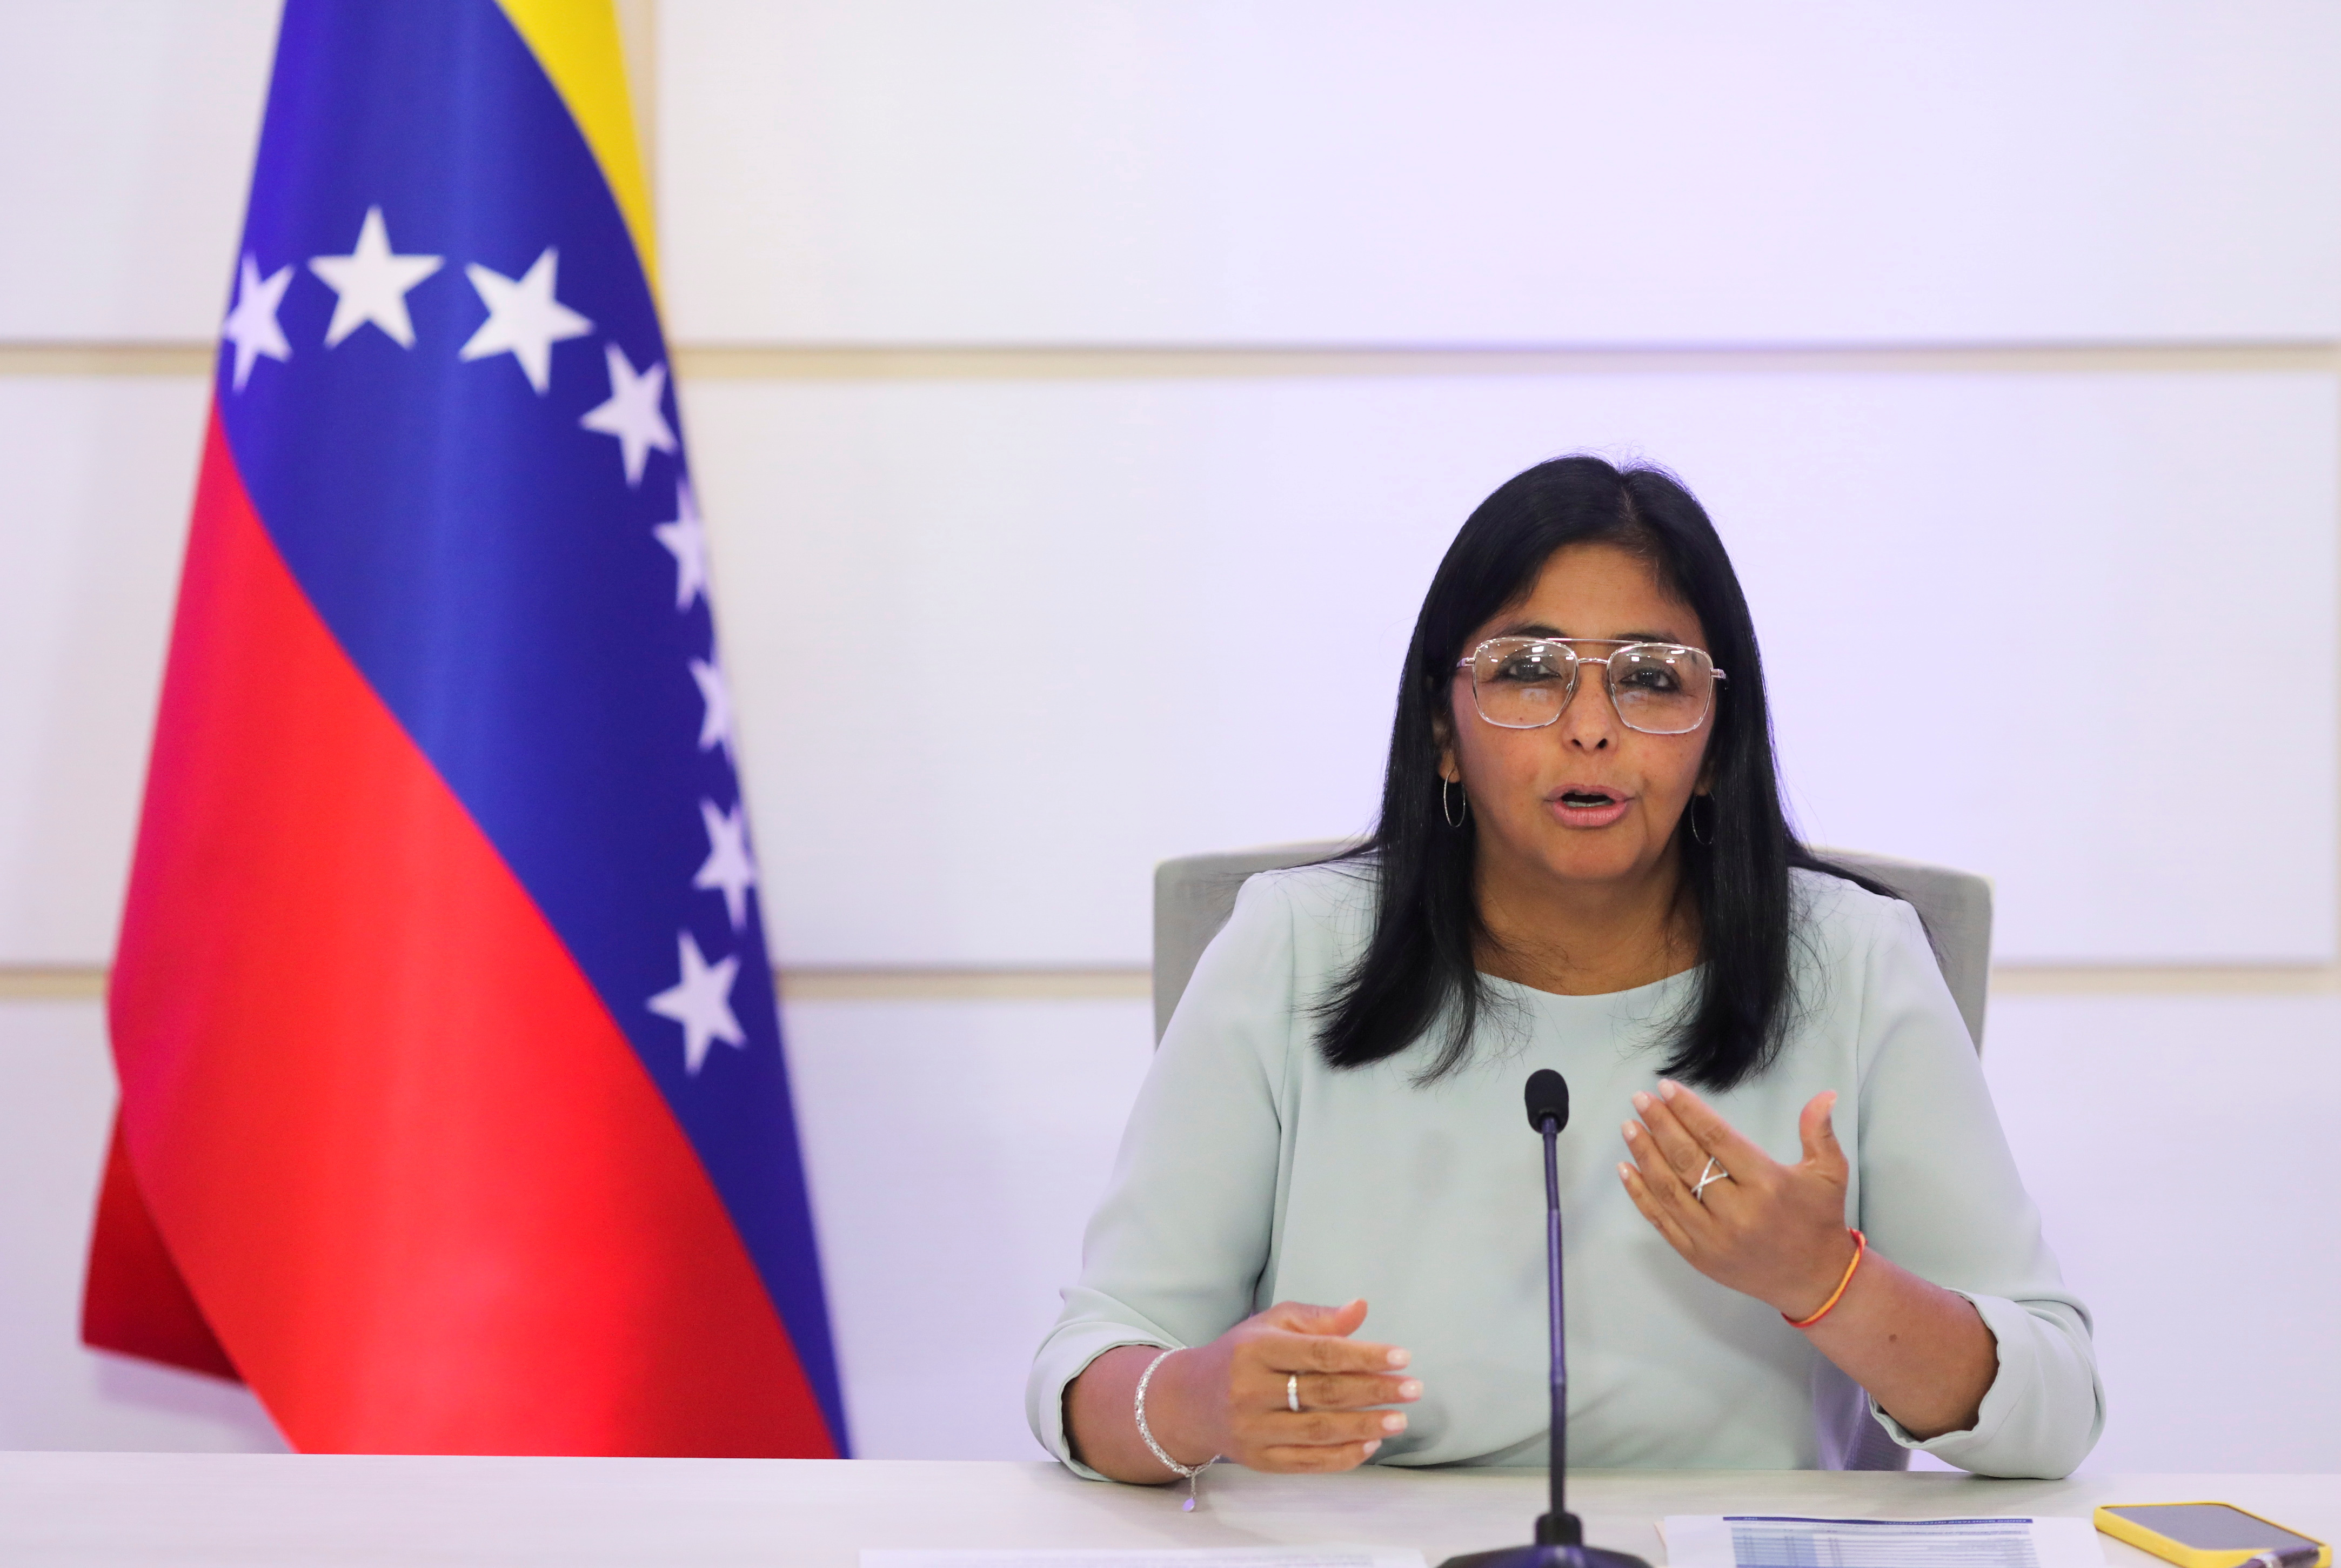 Venezuela's Vice President Delcy Rodriguez gestures as she speaks during a news conference in Caracas, Venezuela, April 7, 2021. REUTERS/Manaure Quintero